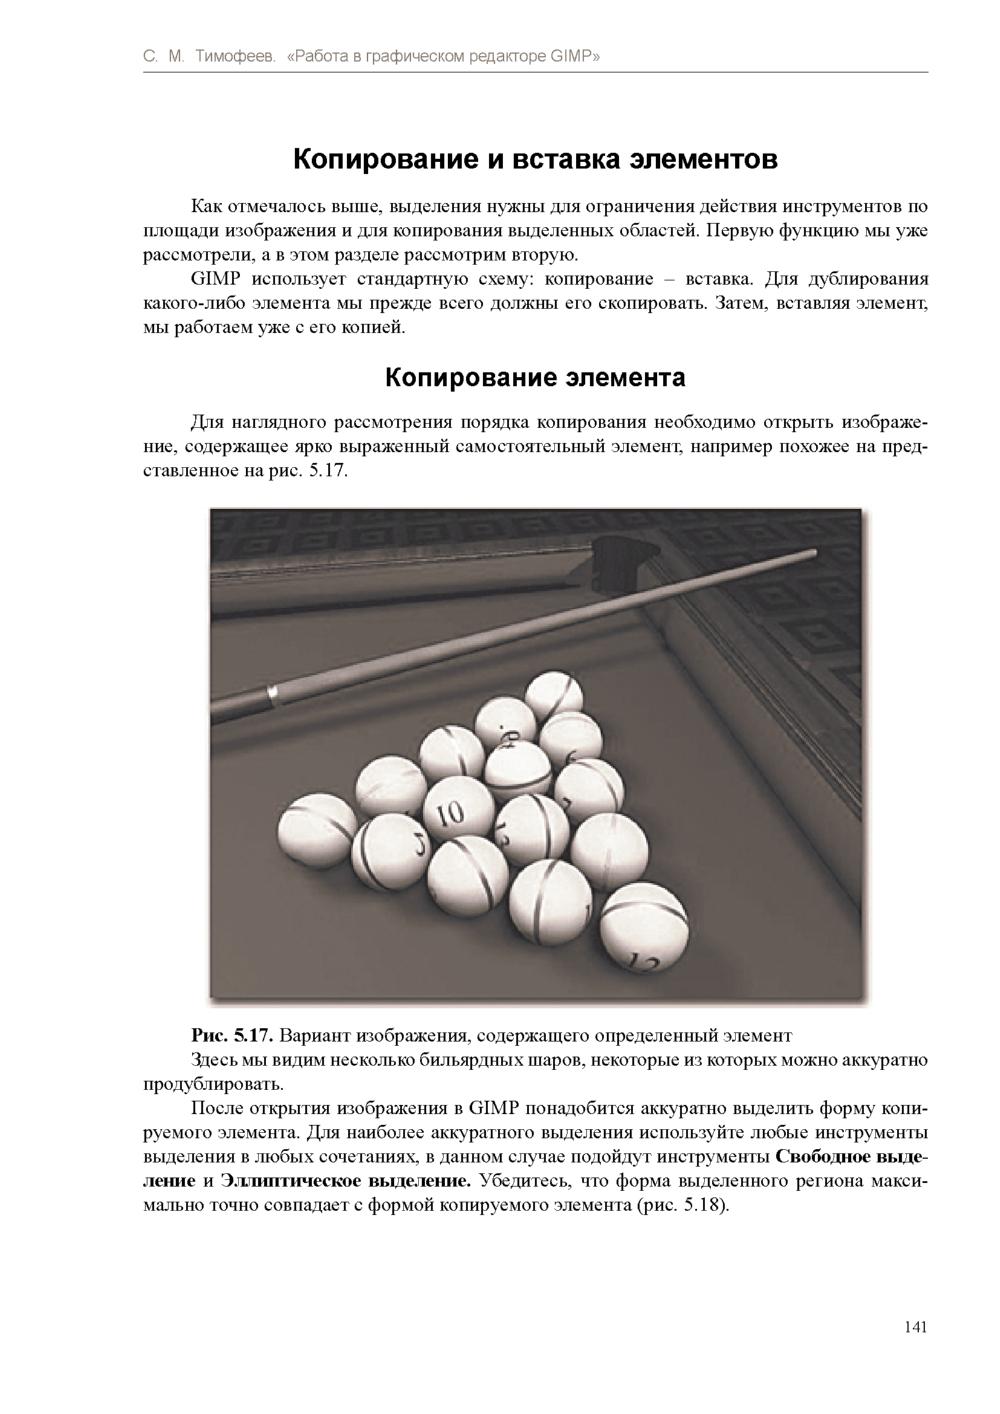 http://i6.imageban.ru/out/2013/12/13/253aac7f1304798a6ed3378349130695.jpg